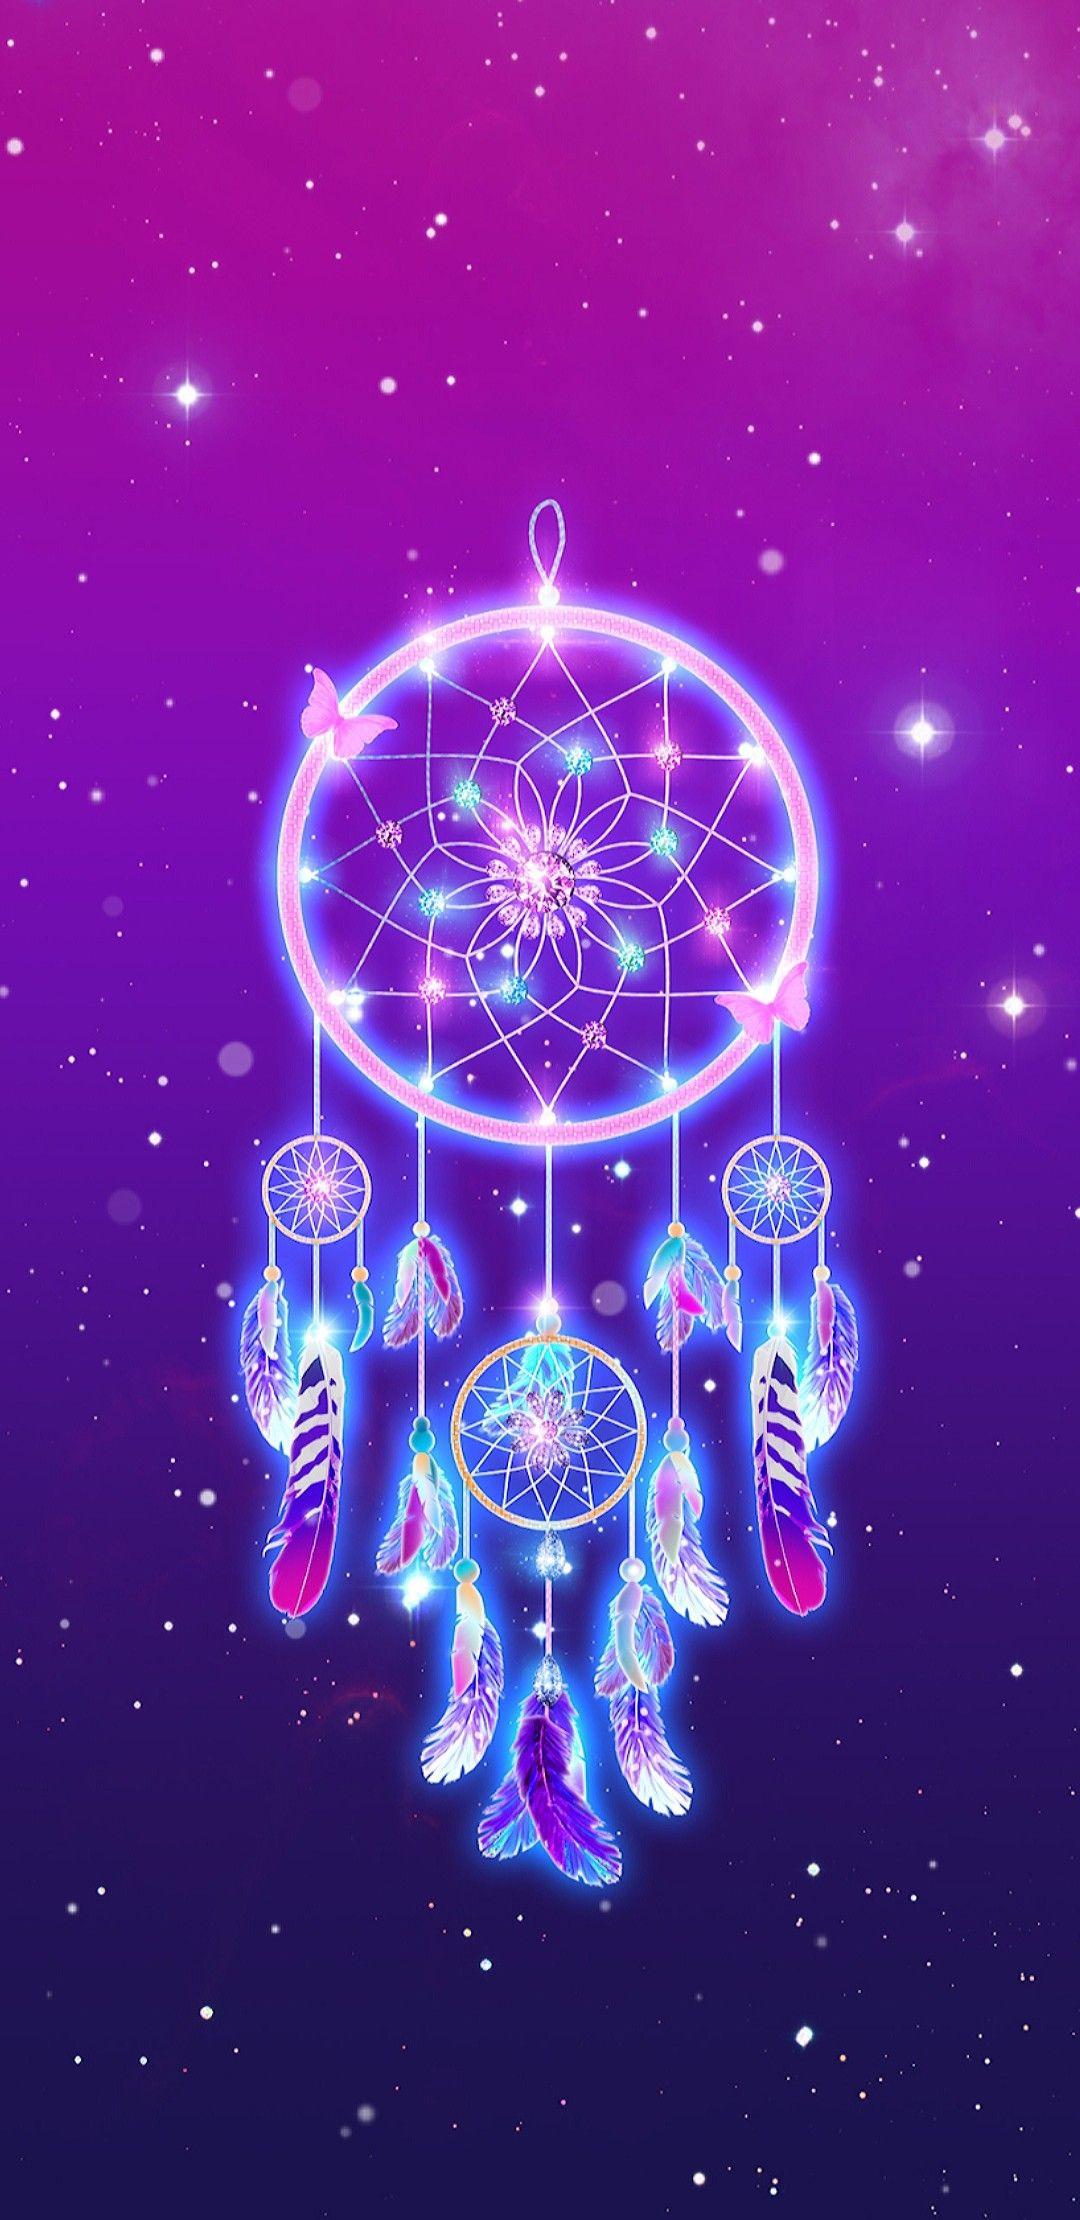 Hola Sigueme Valentina Maria Dreamcatcher Wallpaper Galaxy